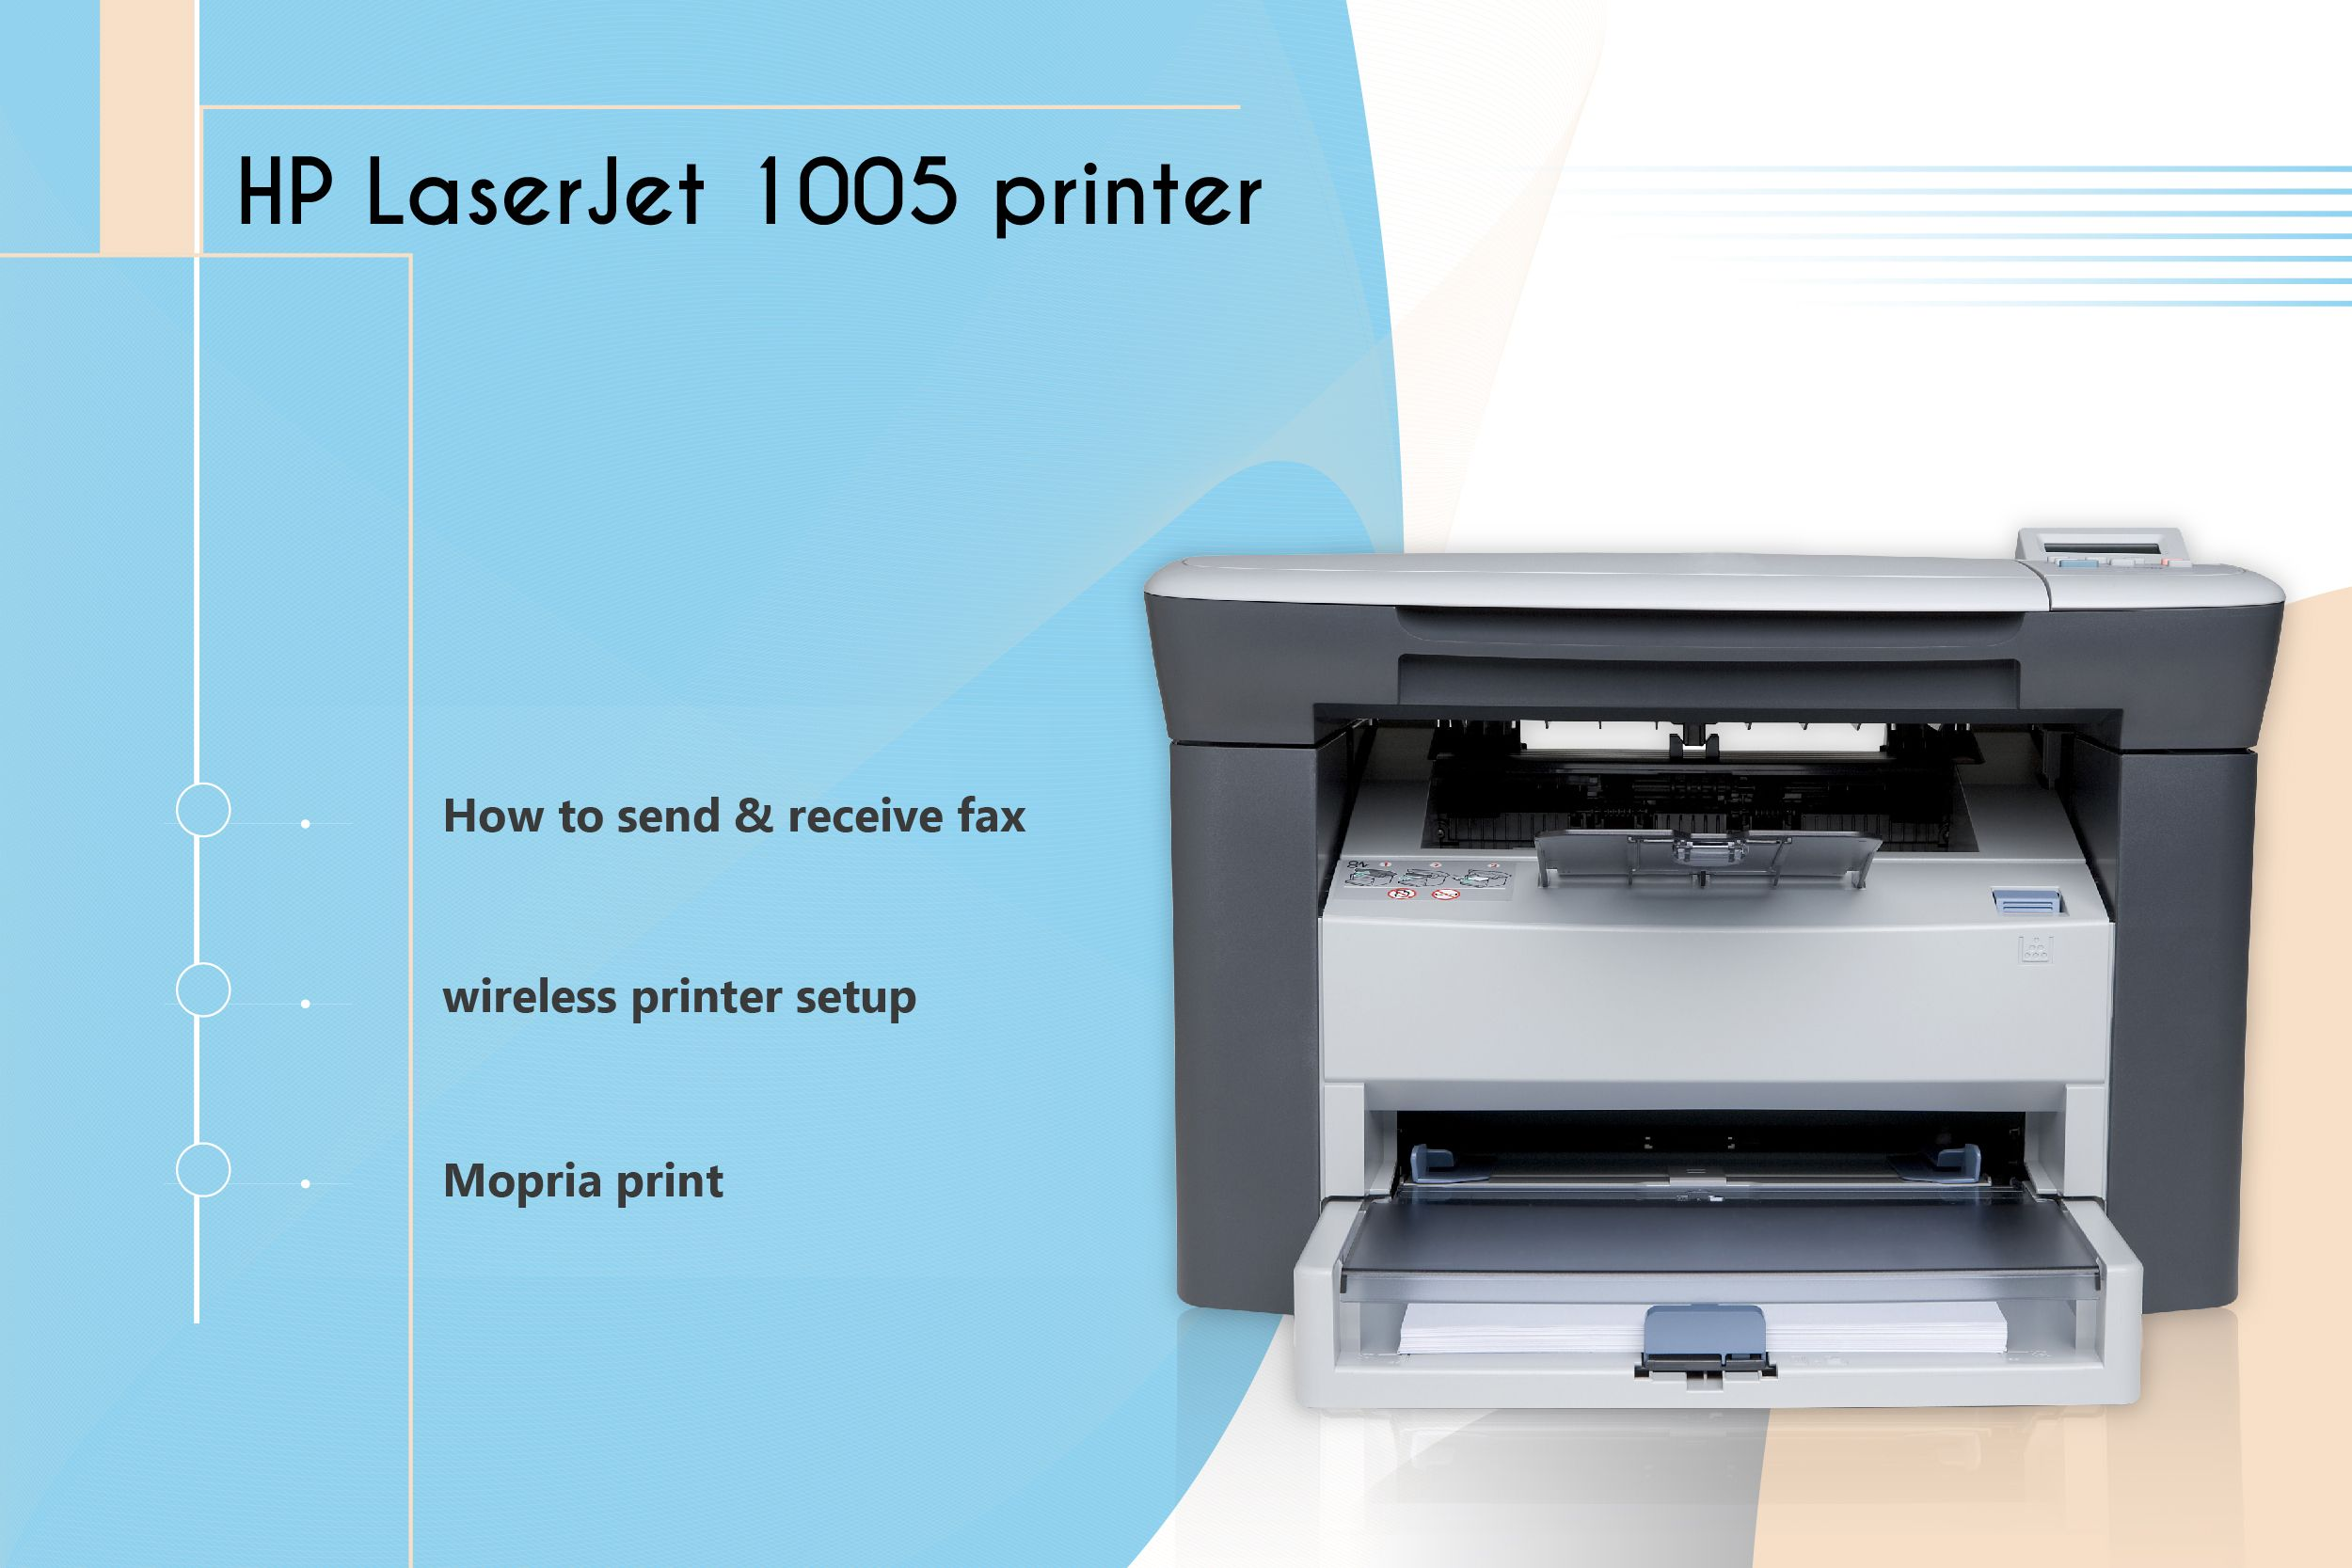 Assistance for hp laserjet 1005 printer wireless setup